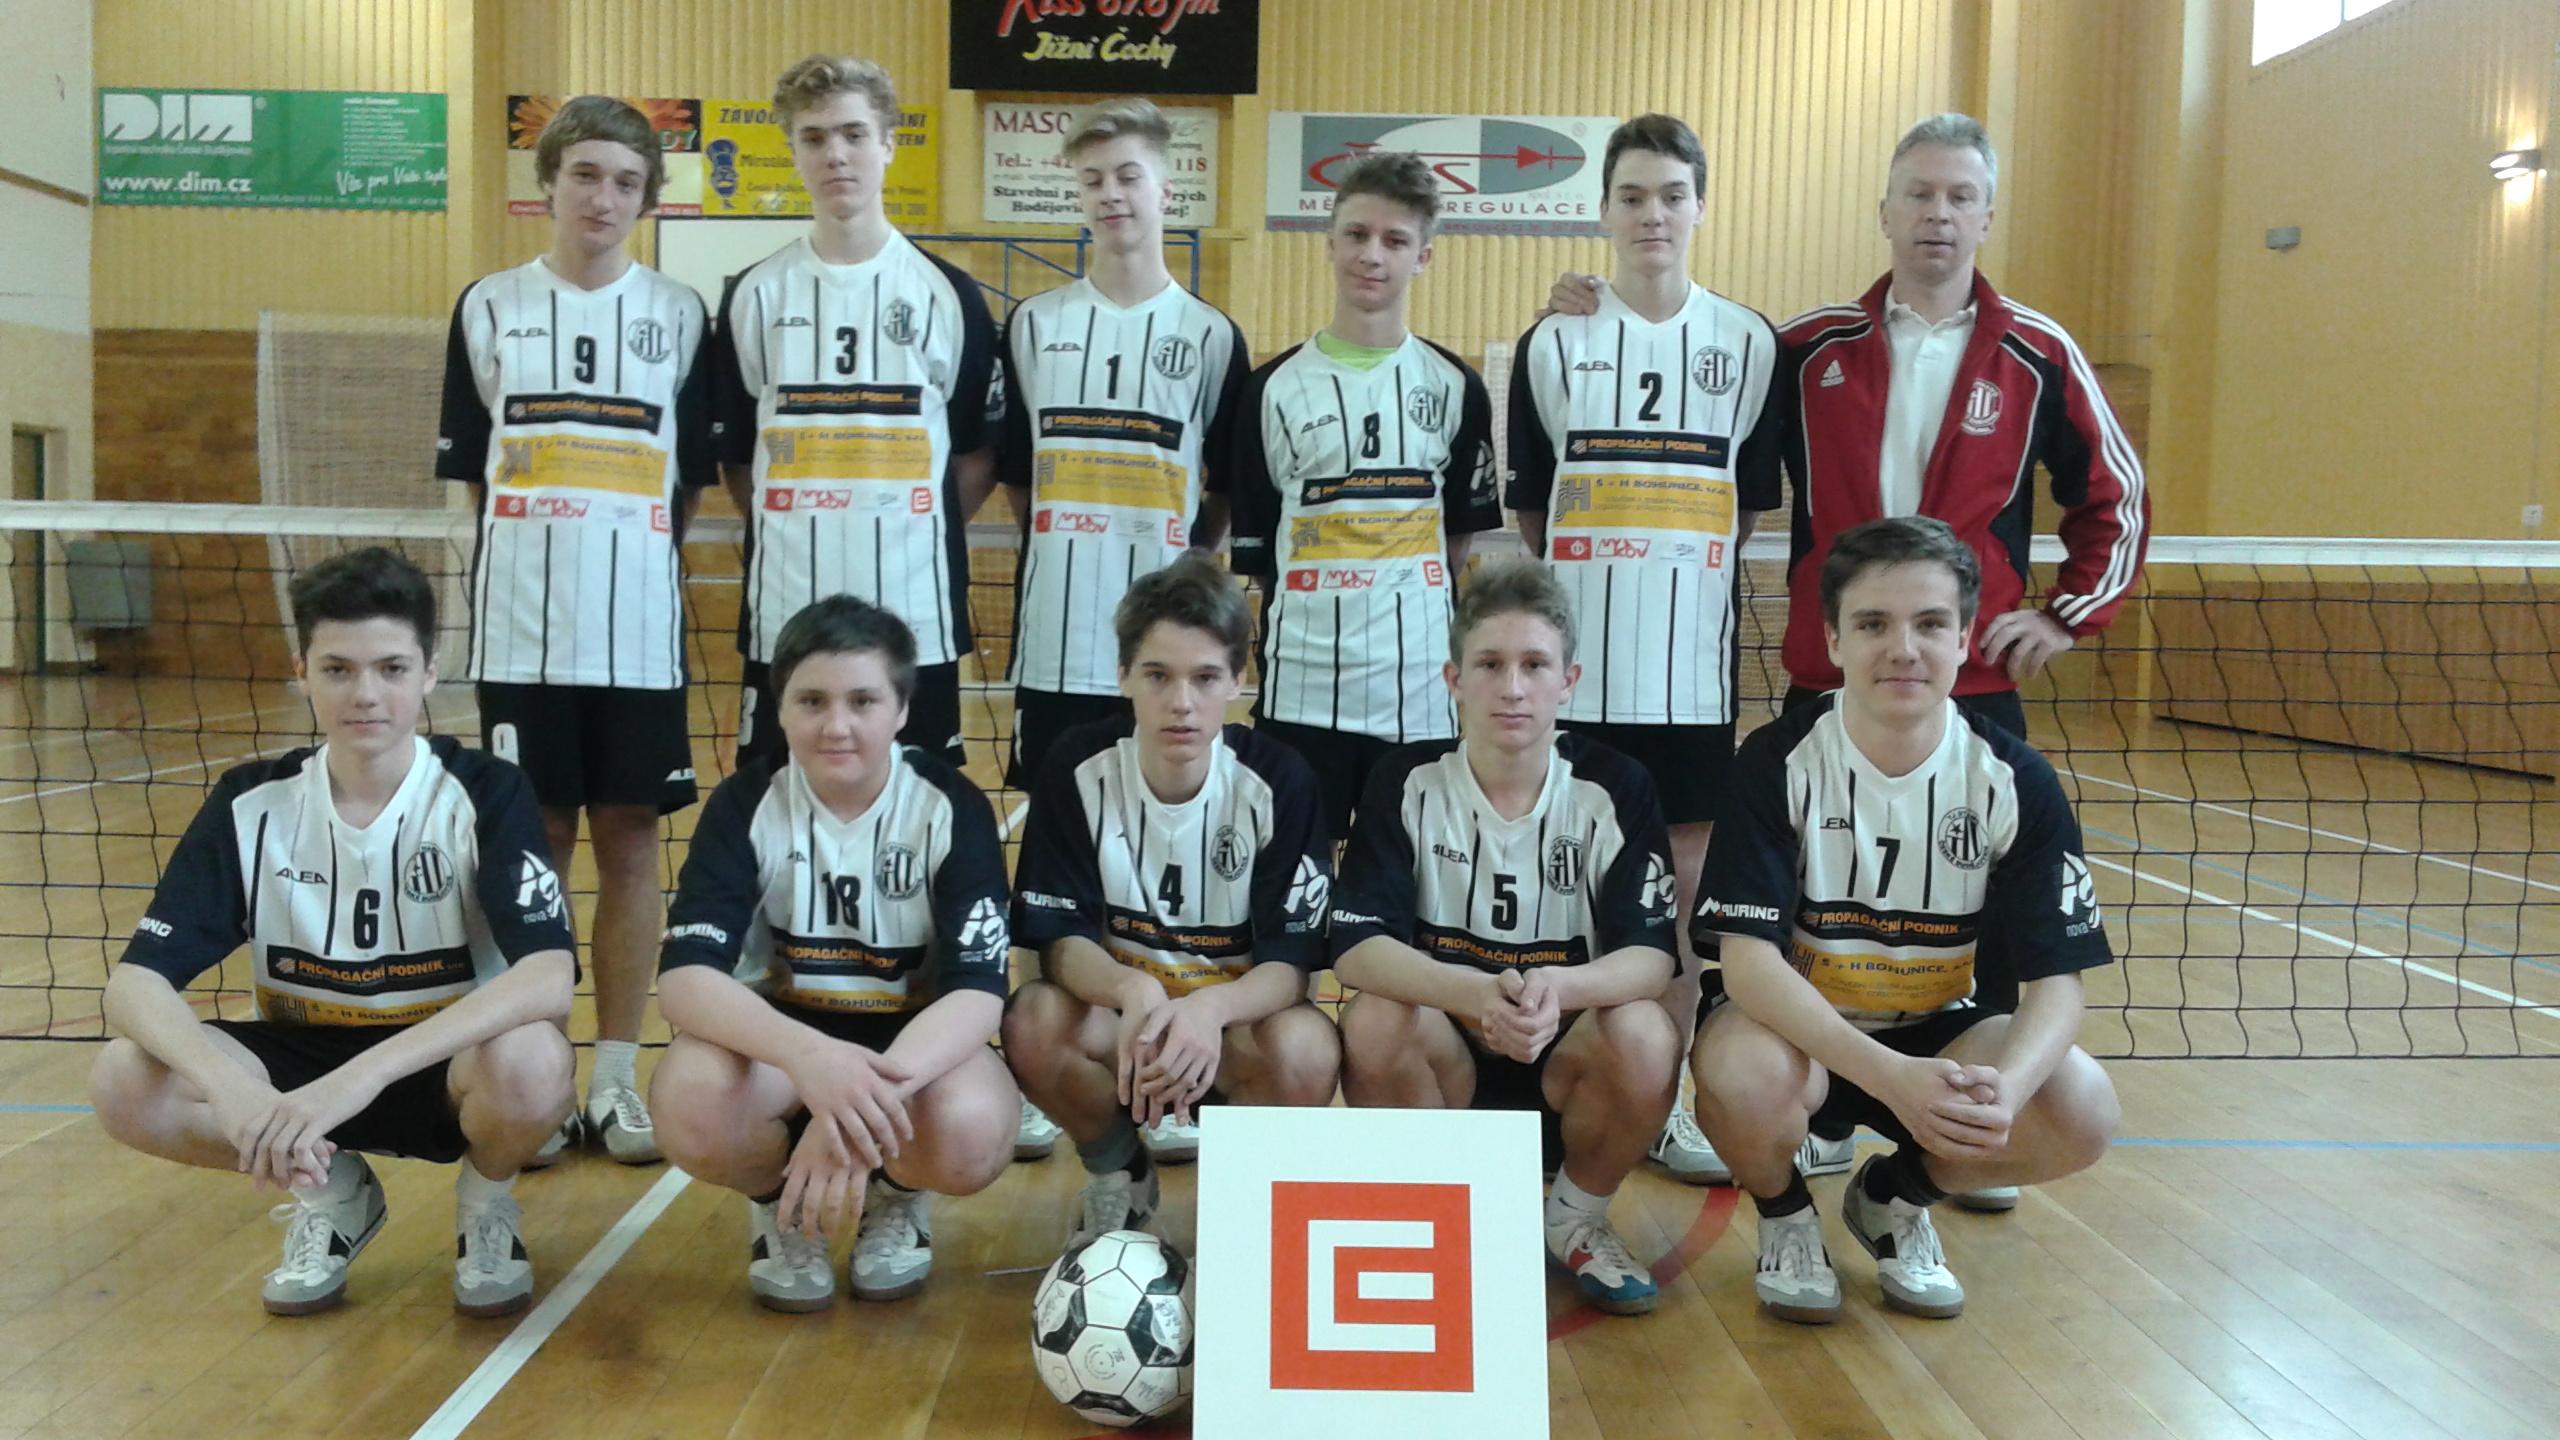 Dynamo ČB ČEZ